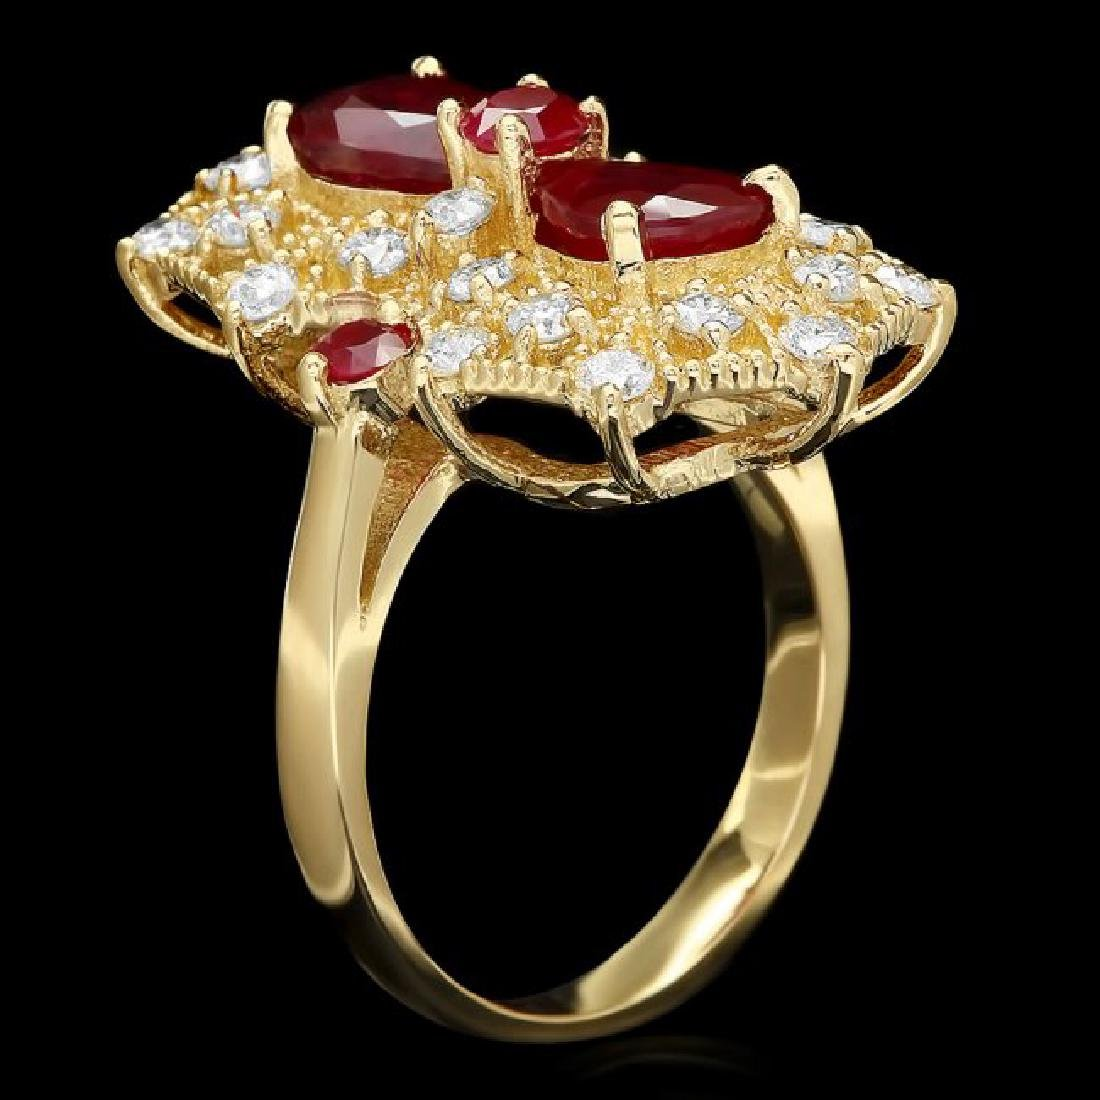 14k Yellow Gold 4.2ct Ruby 1.00ct Diamond Ring - 2